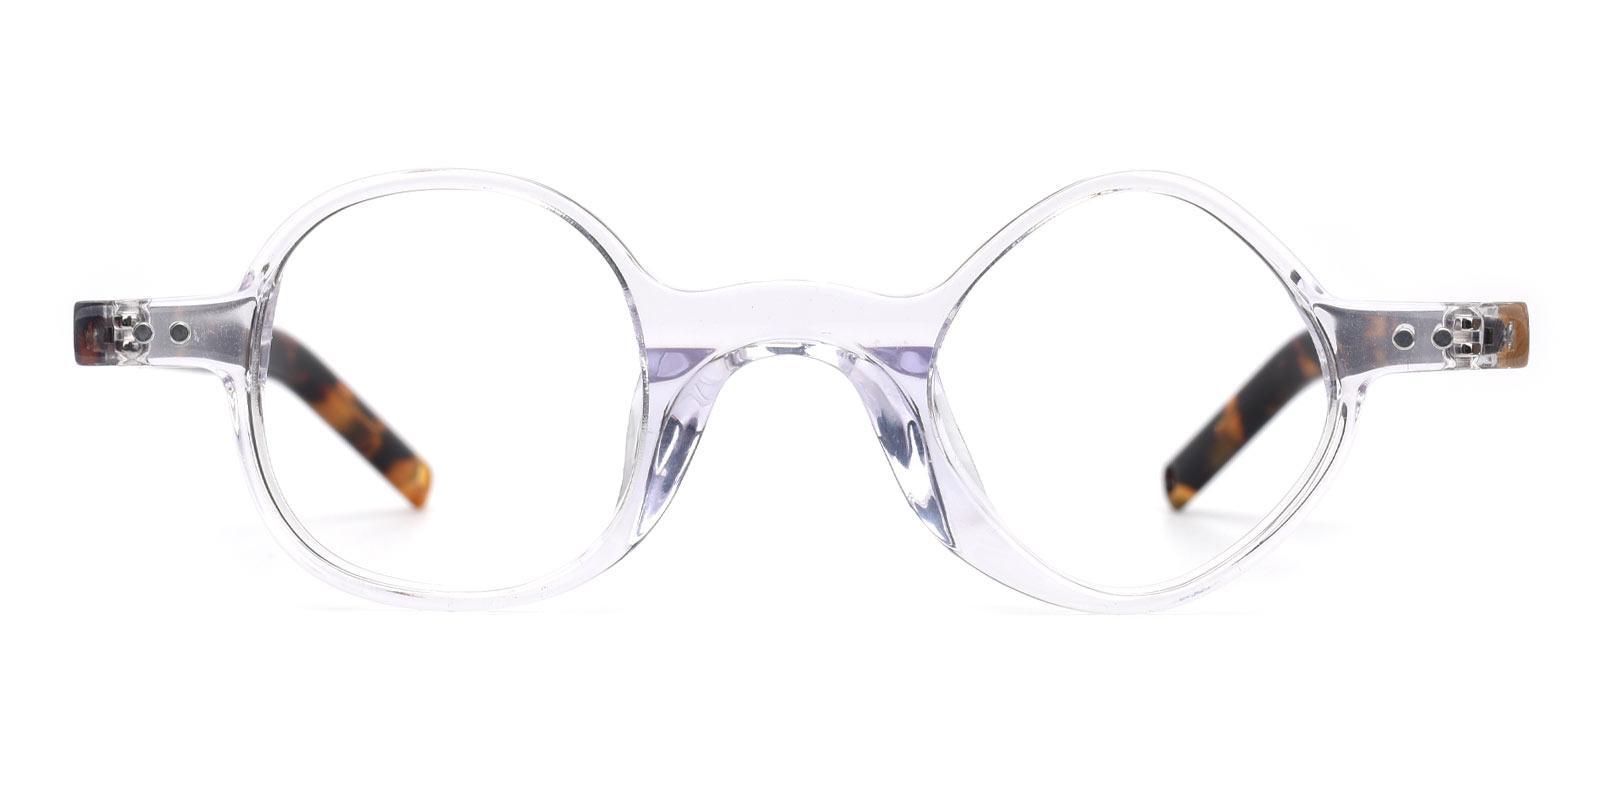 Ryan-Translucent-Geometric-TR-Eyeglasses-detail